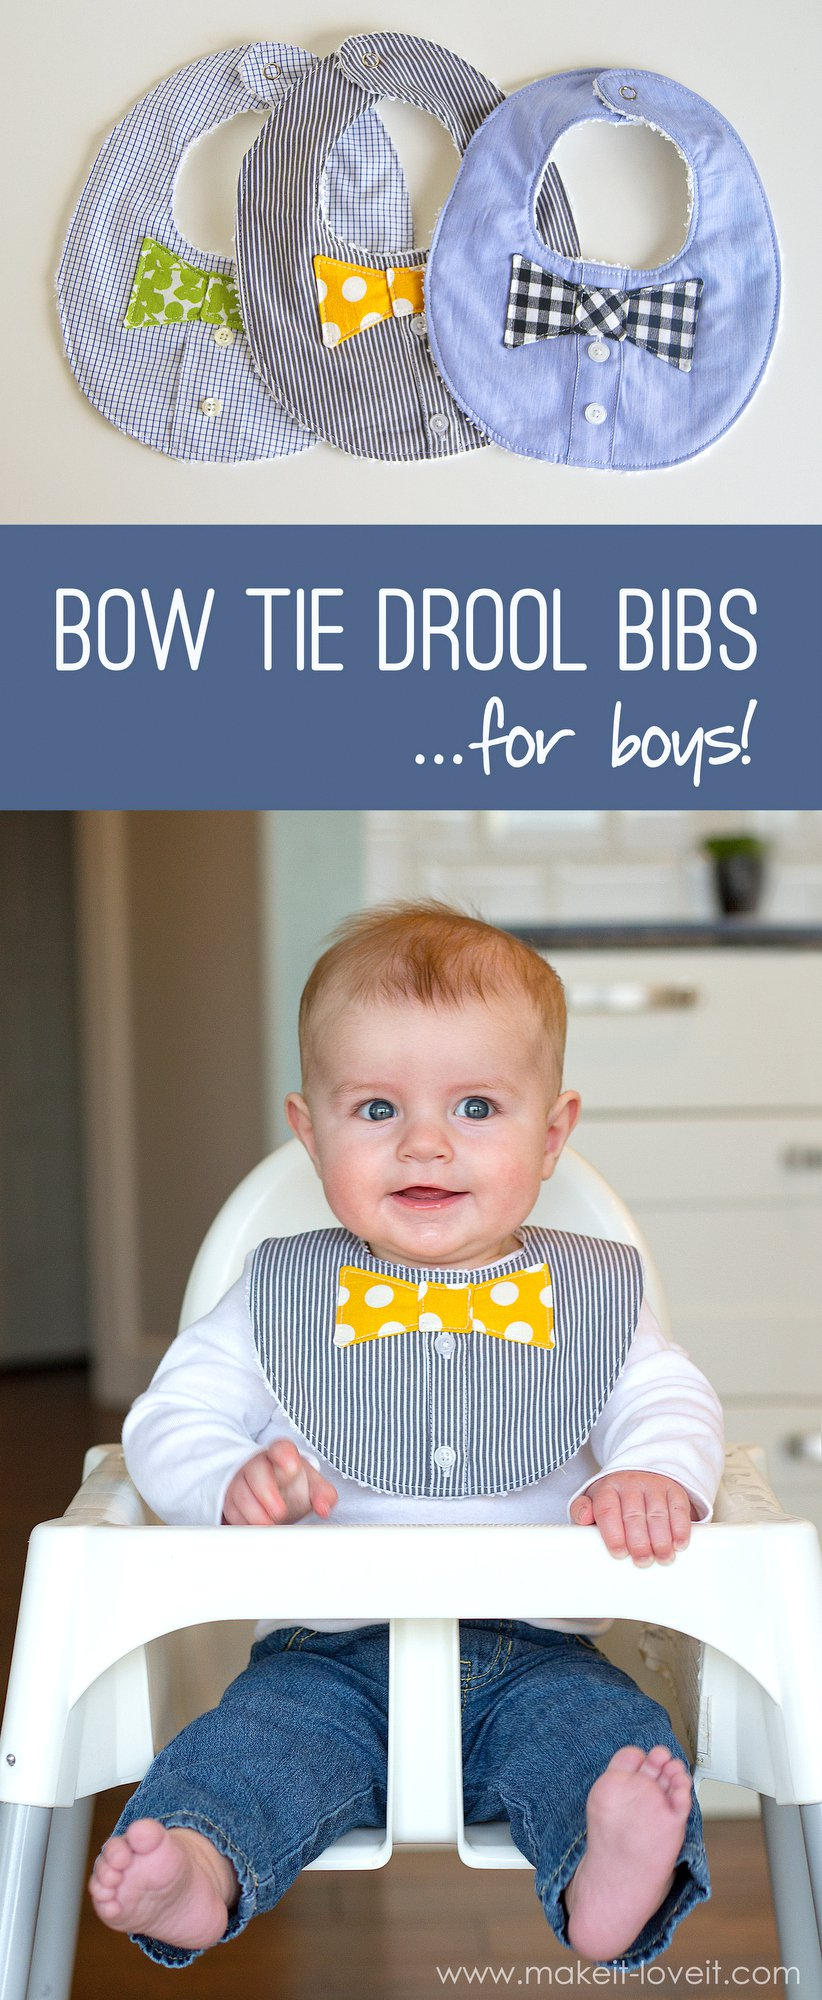 diy-bow-tie-drool-bibs-for-boys-1